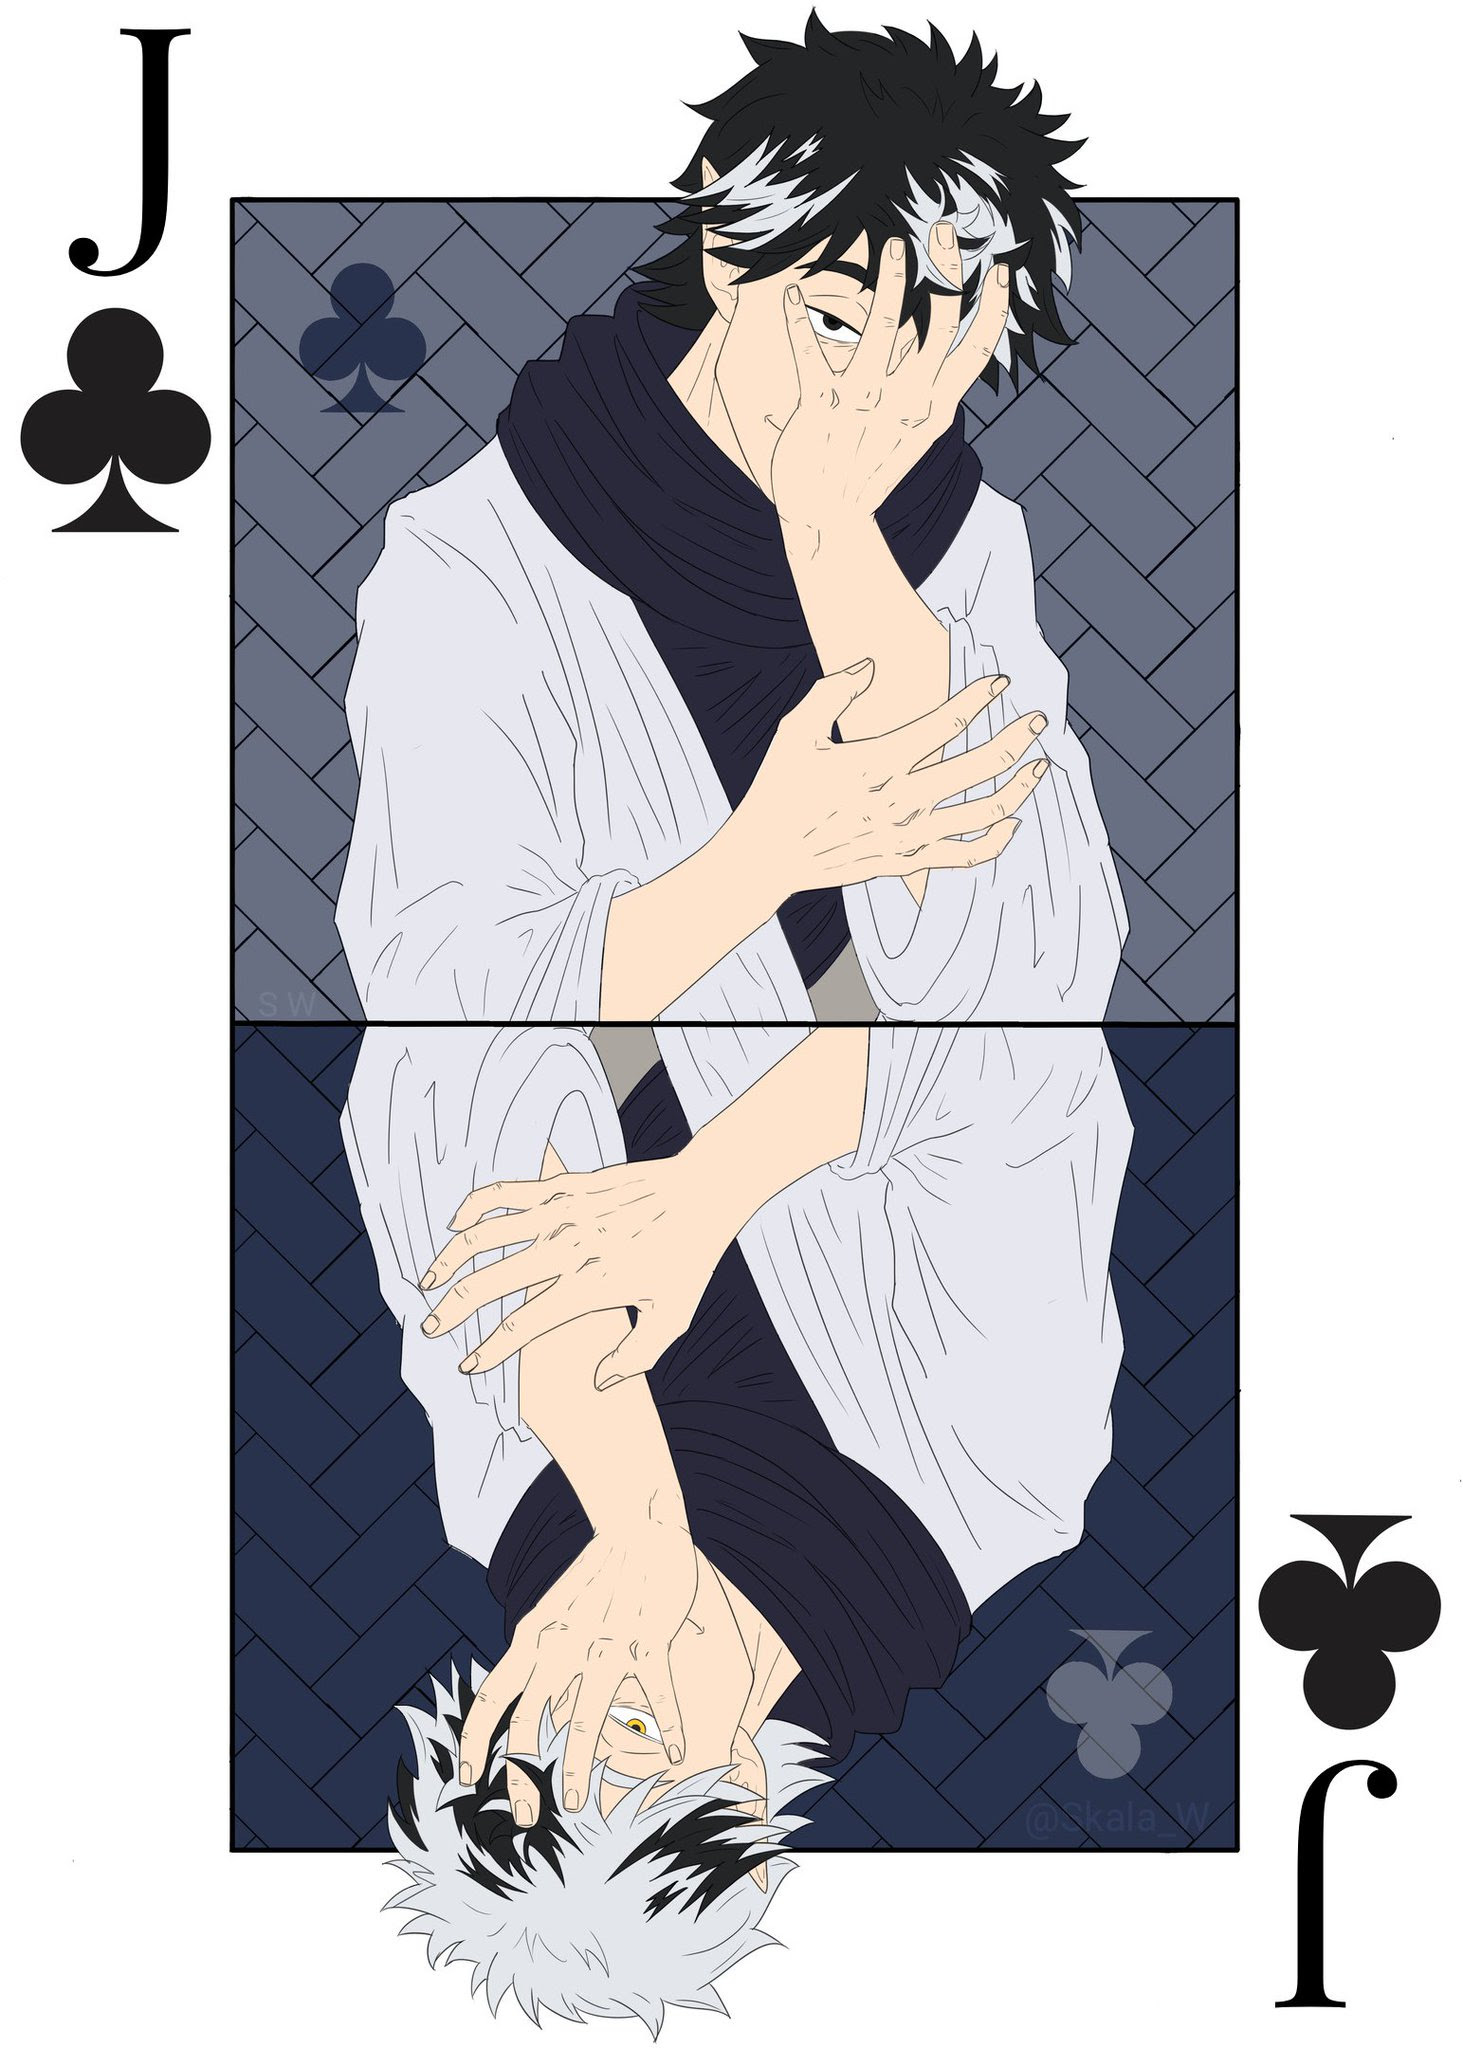 Black Clover Chibi Wallpaper Anime Wallpaper Hd